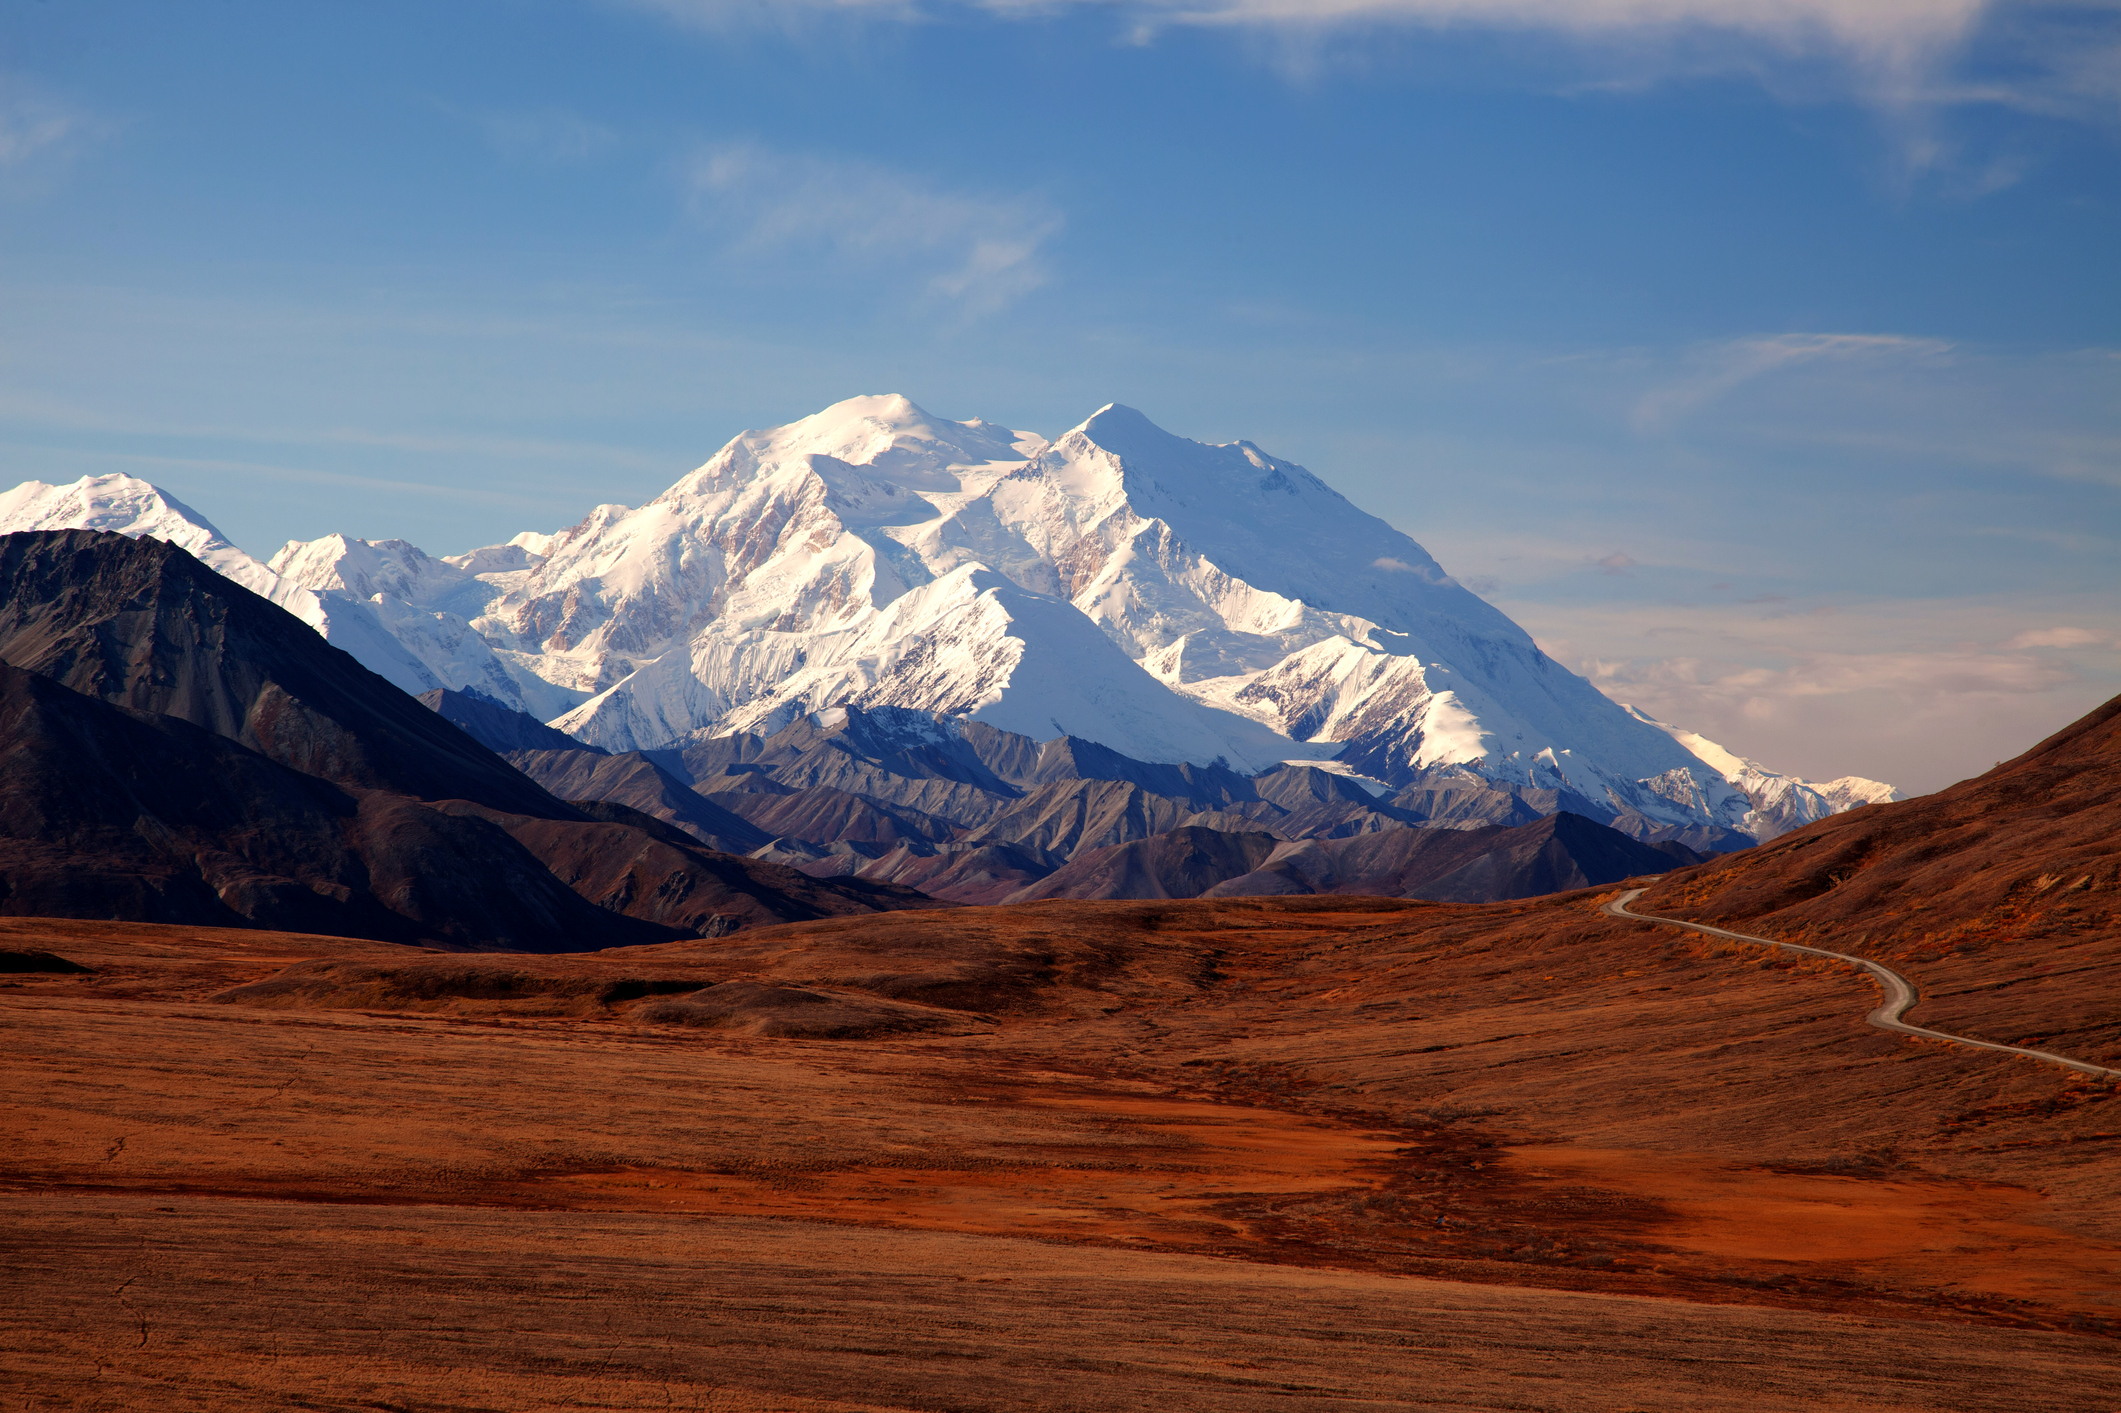 Huge, snow-covered peak rises above the horizon.